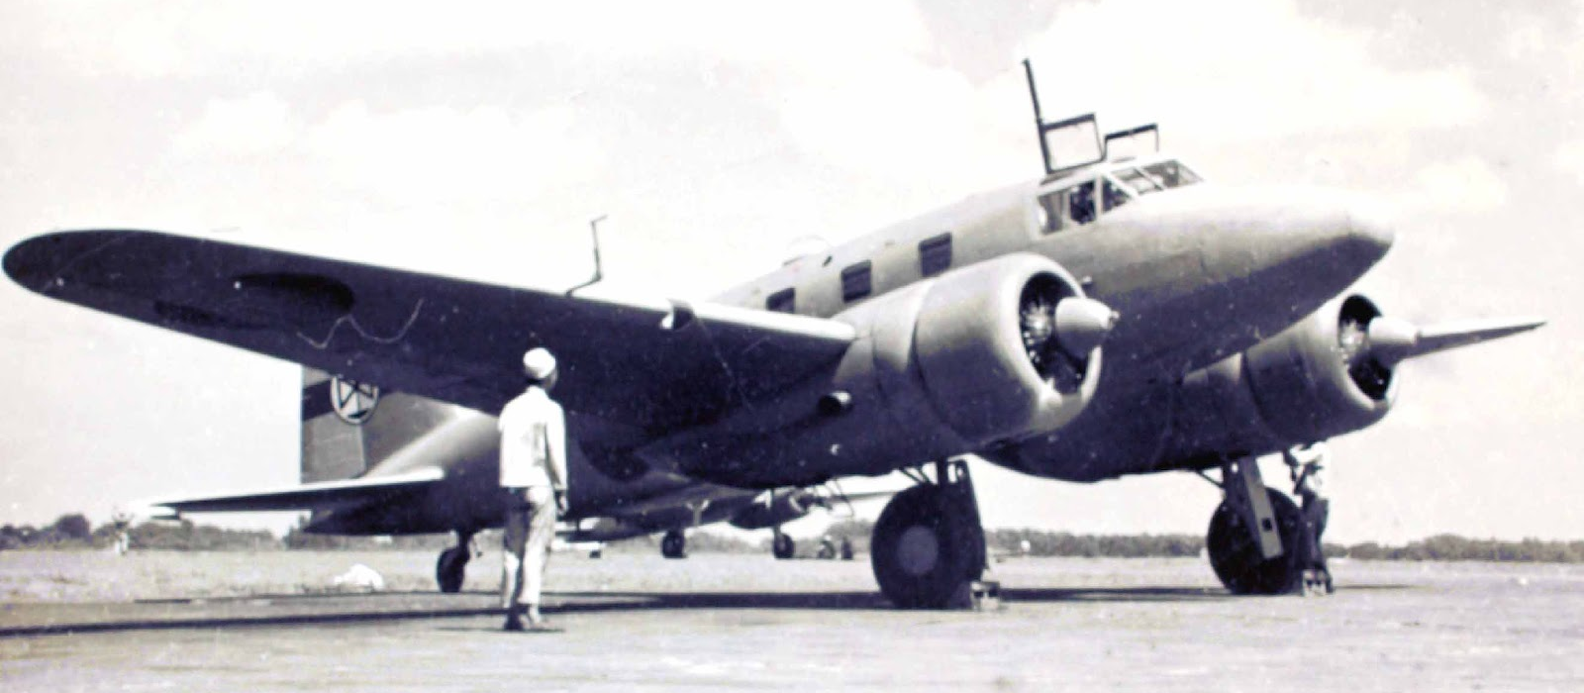 Учебно-тренировочный самолет Tachikawa Ki-54